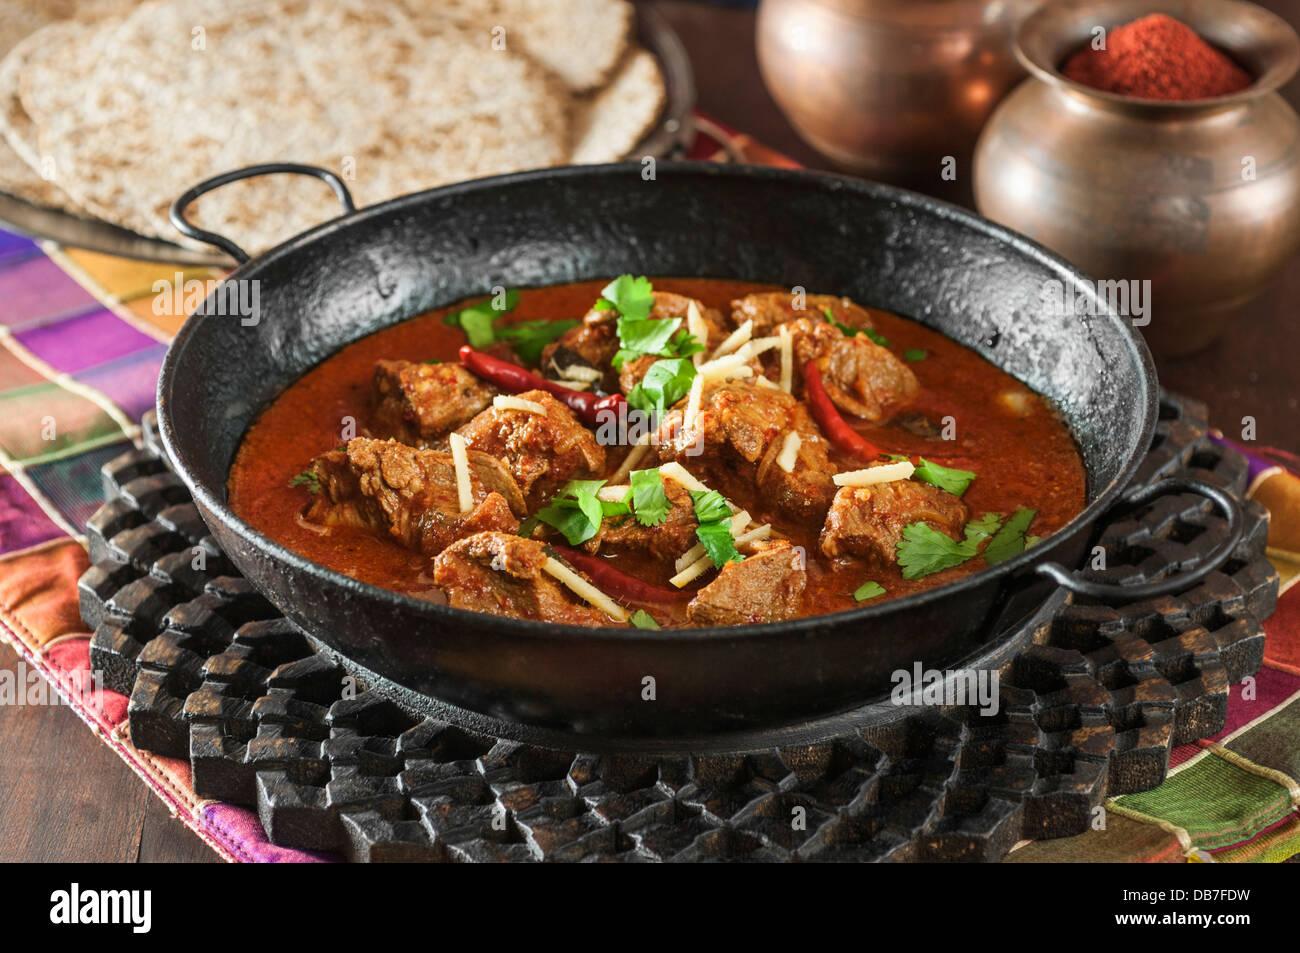 Jungli Laal Maas. Spicy lamb curry Rajasthan India - Stock Image